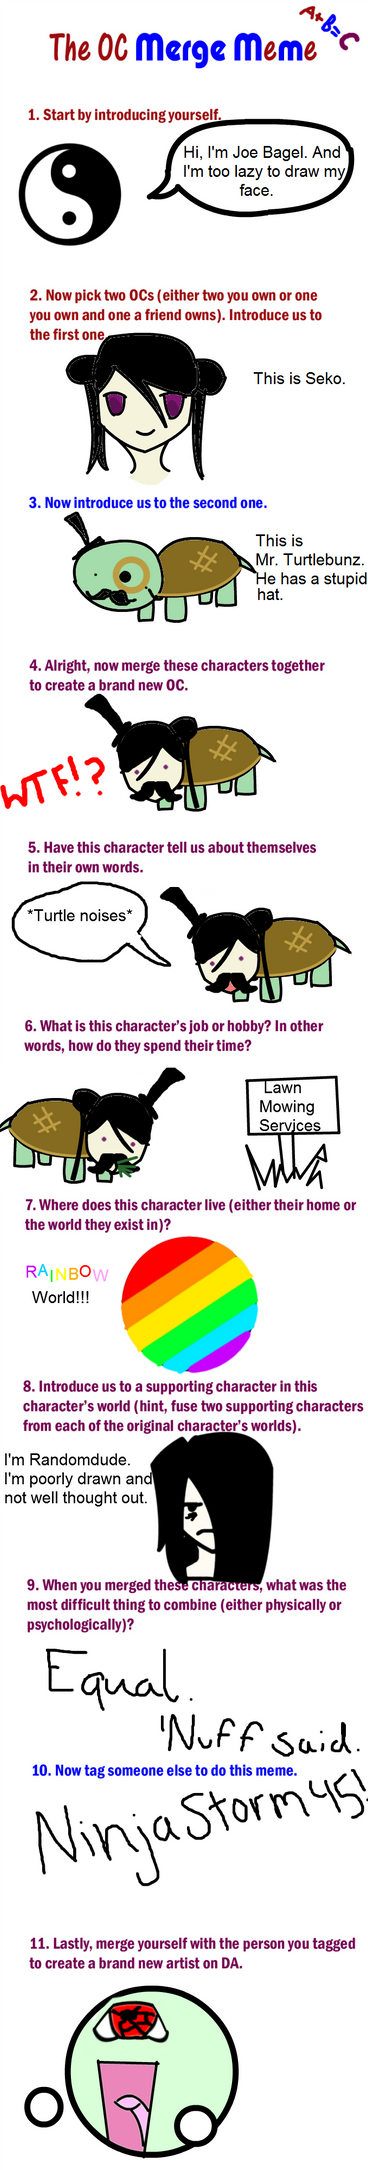 Character merge meme... Poorly drawn... by derpgamer12345